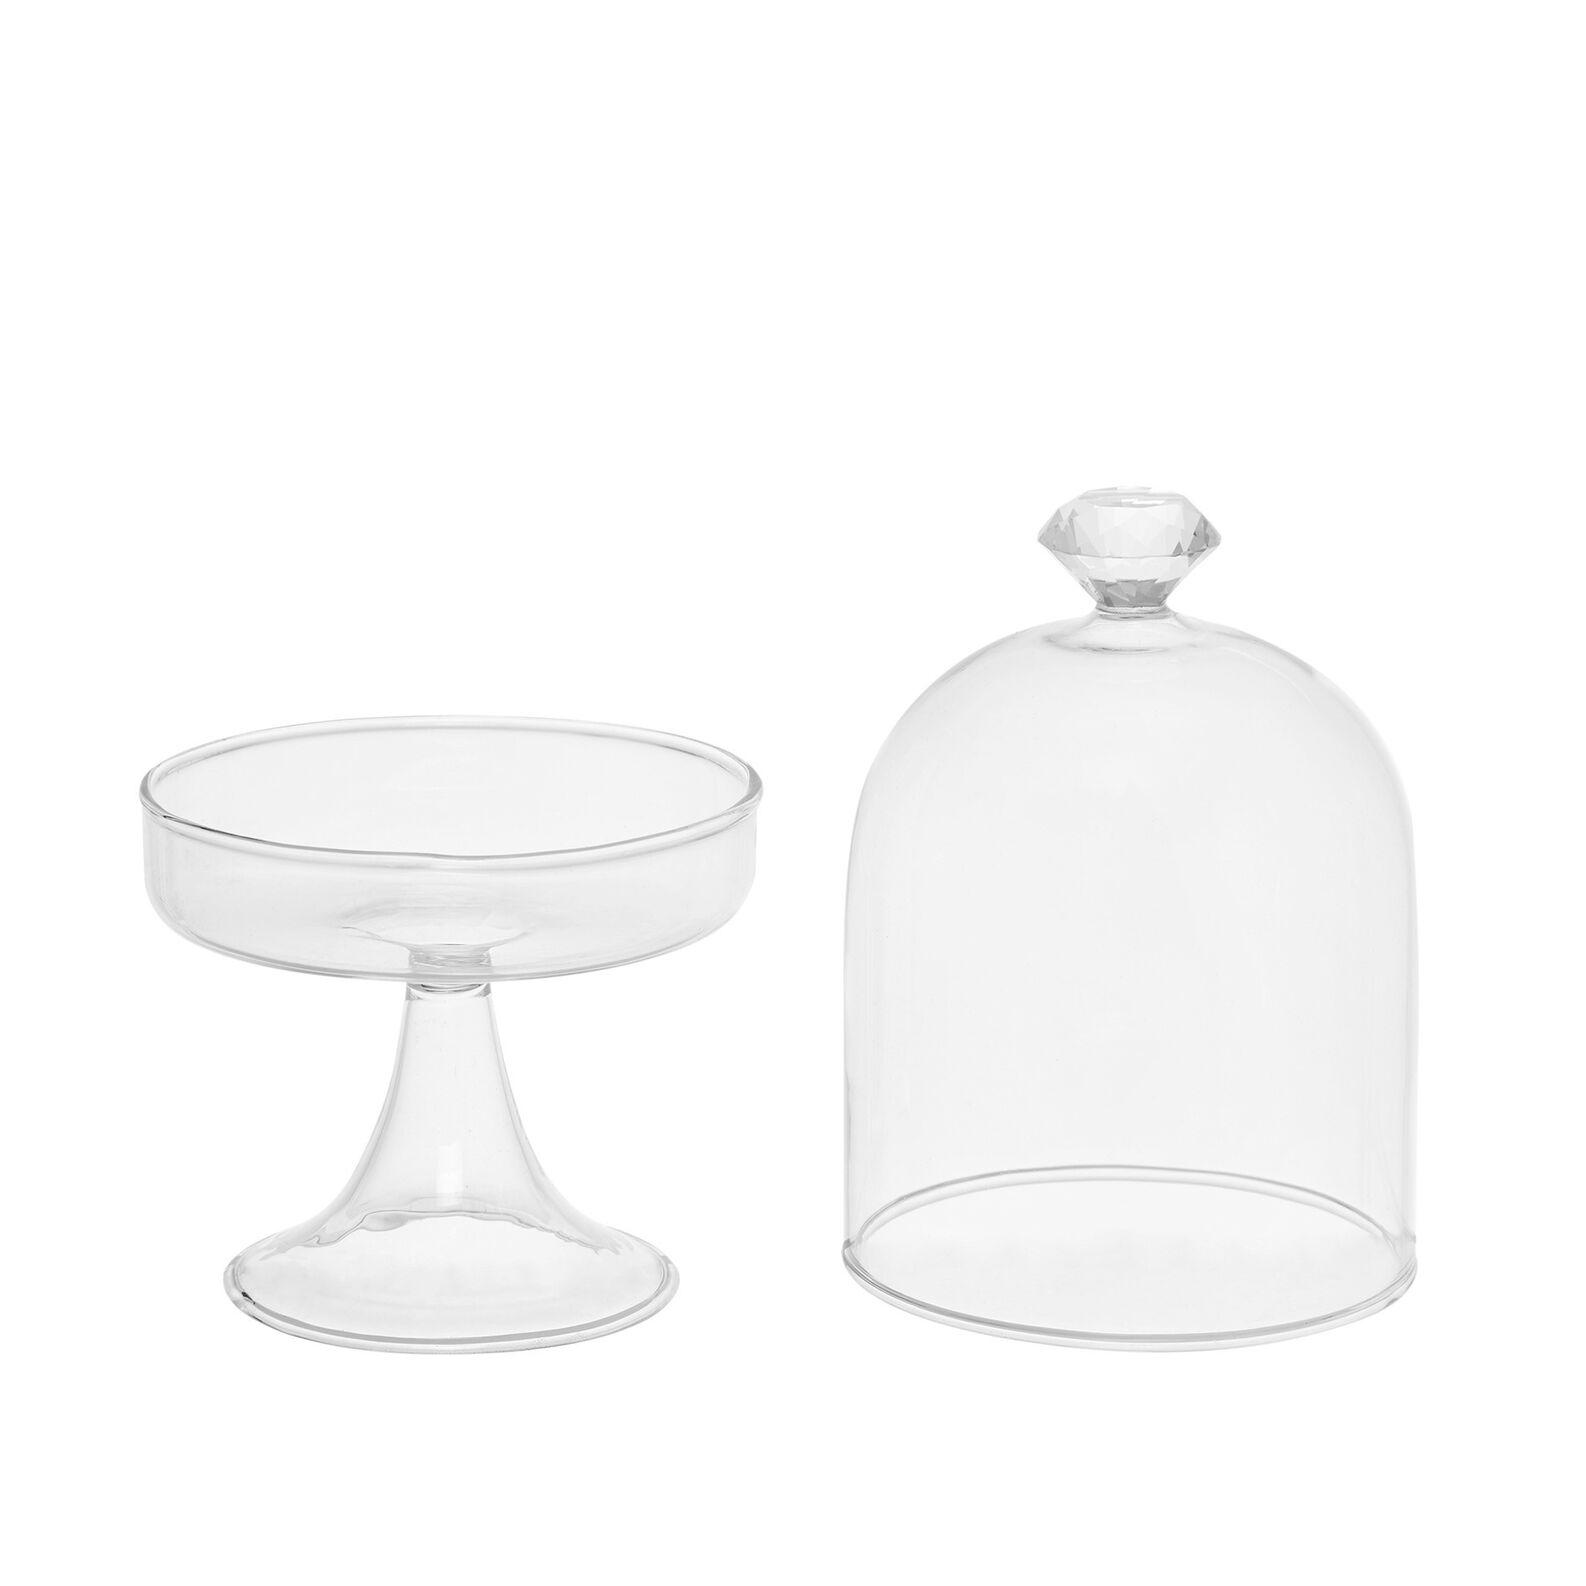 Glass cake stand with diamond